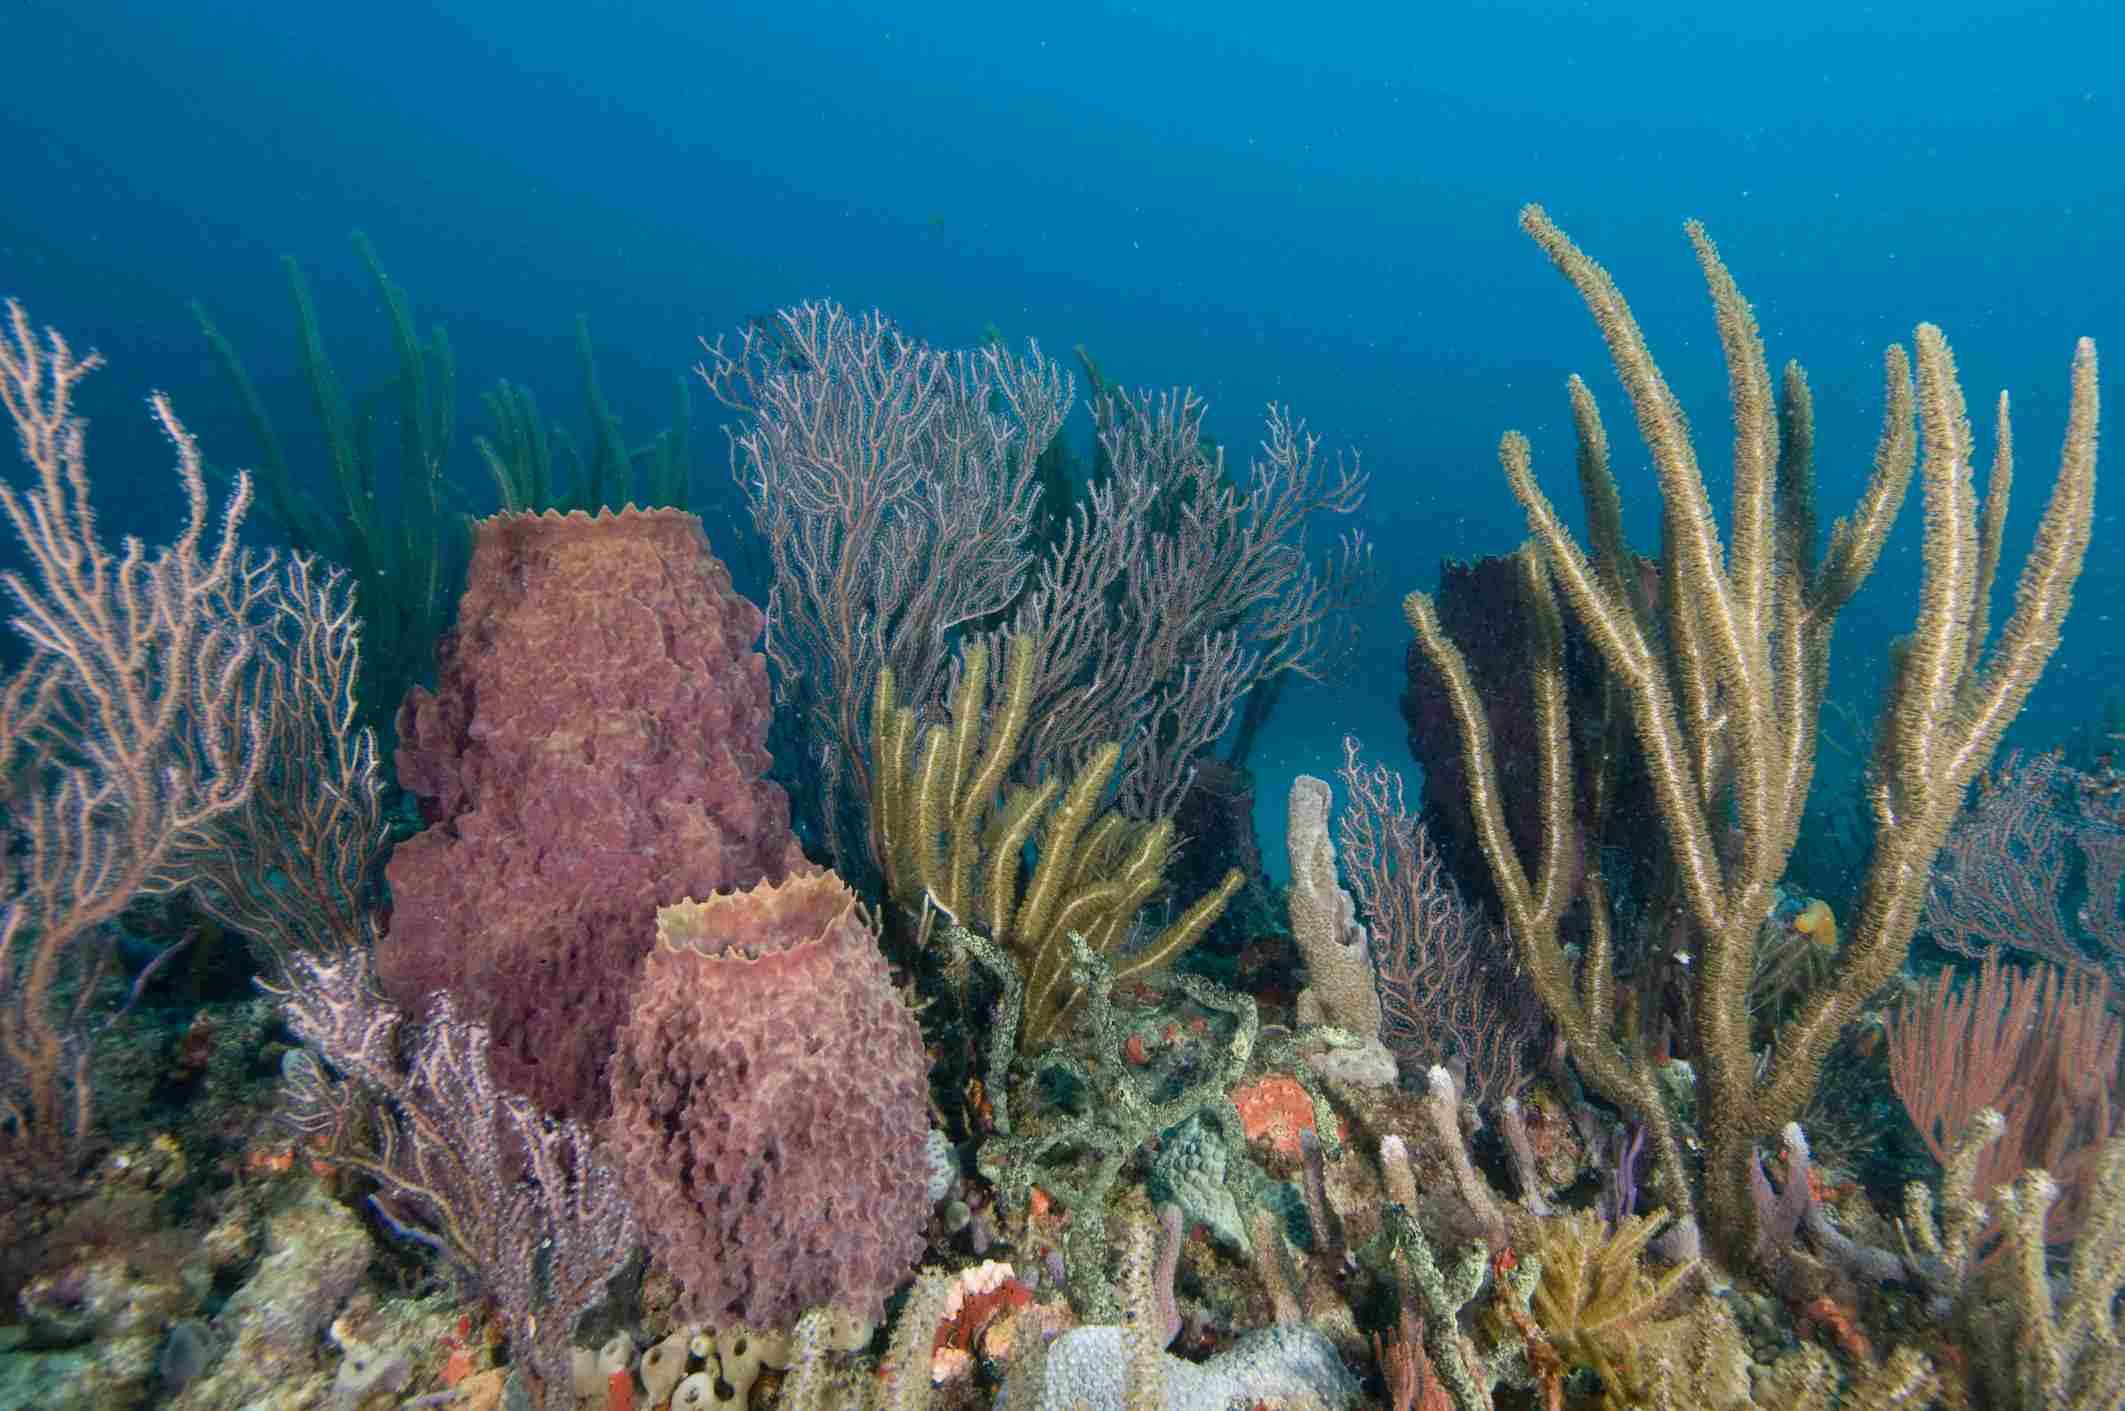 Coral reef, West Palm Beach, Florida